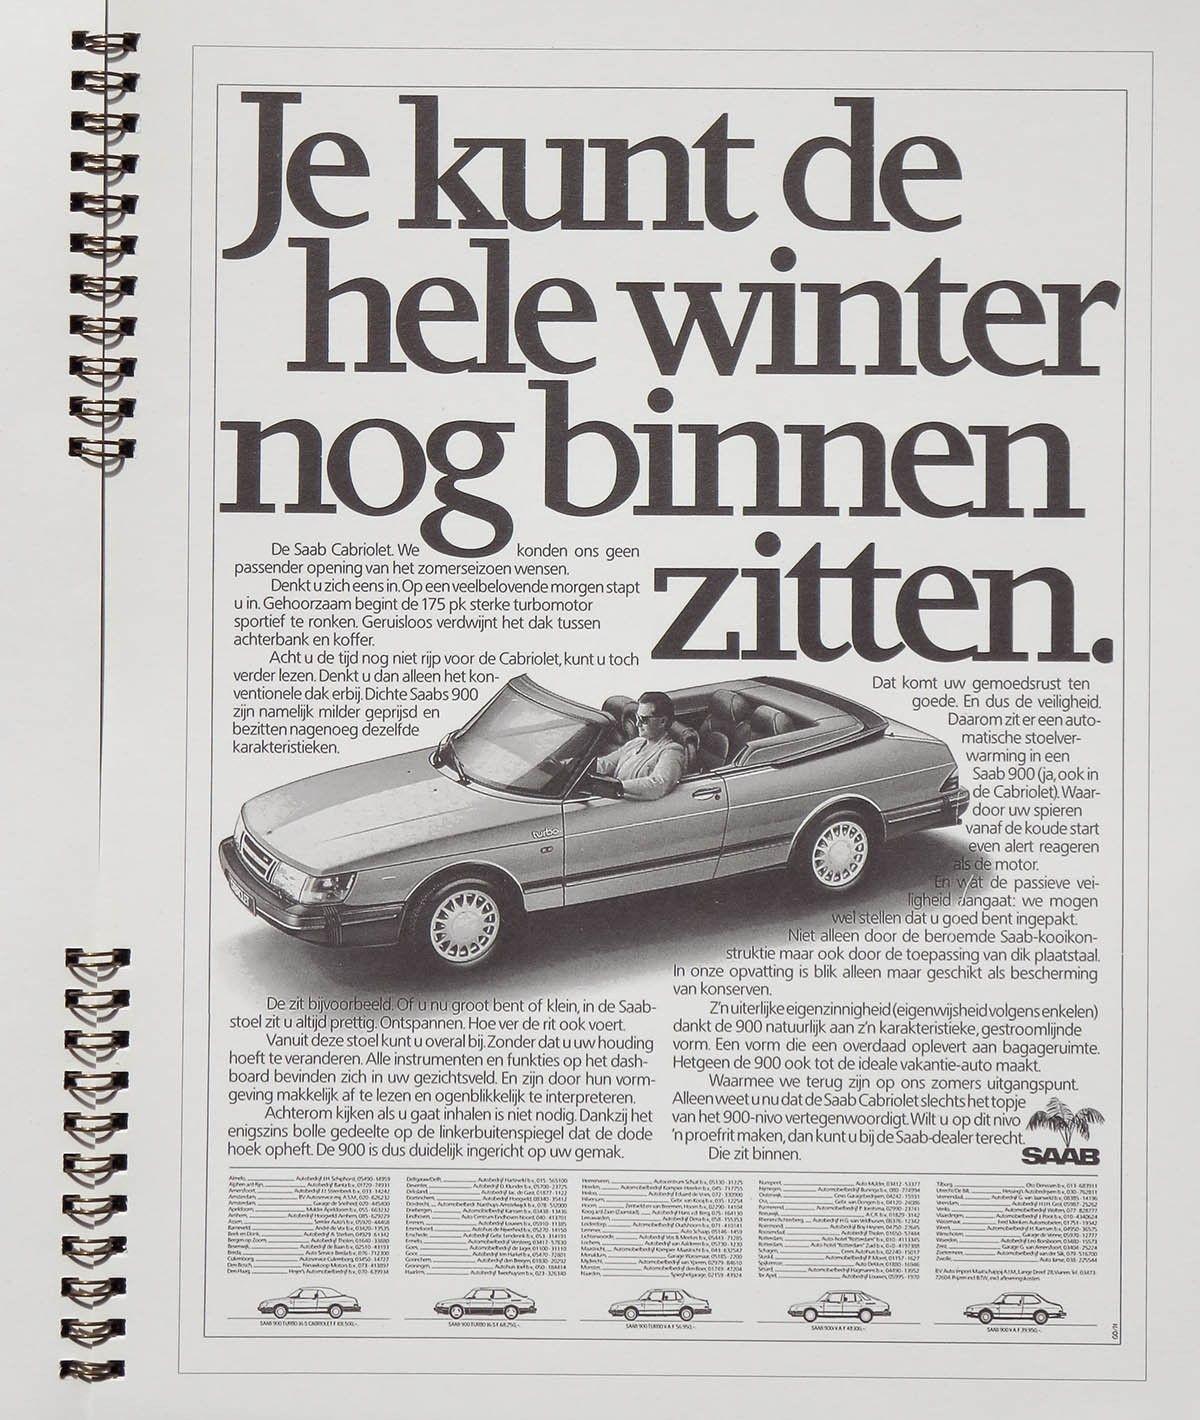 Volvo Cars Motorsport History Reflected At Techno: Pin Van Jan Old Skool Op Saab 900 Classic Turbo